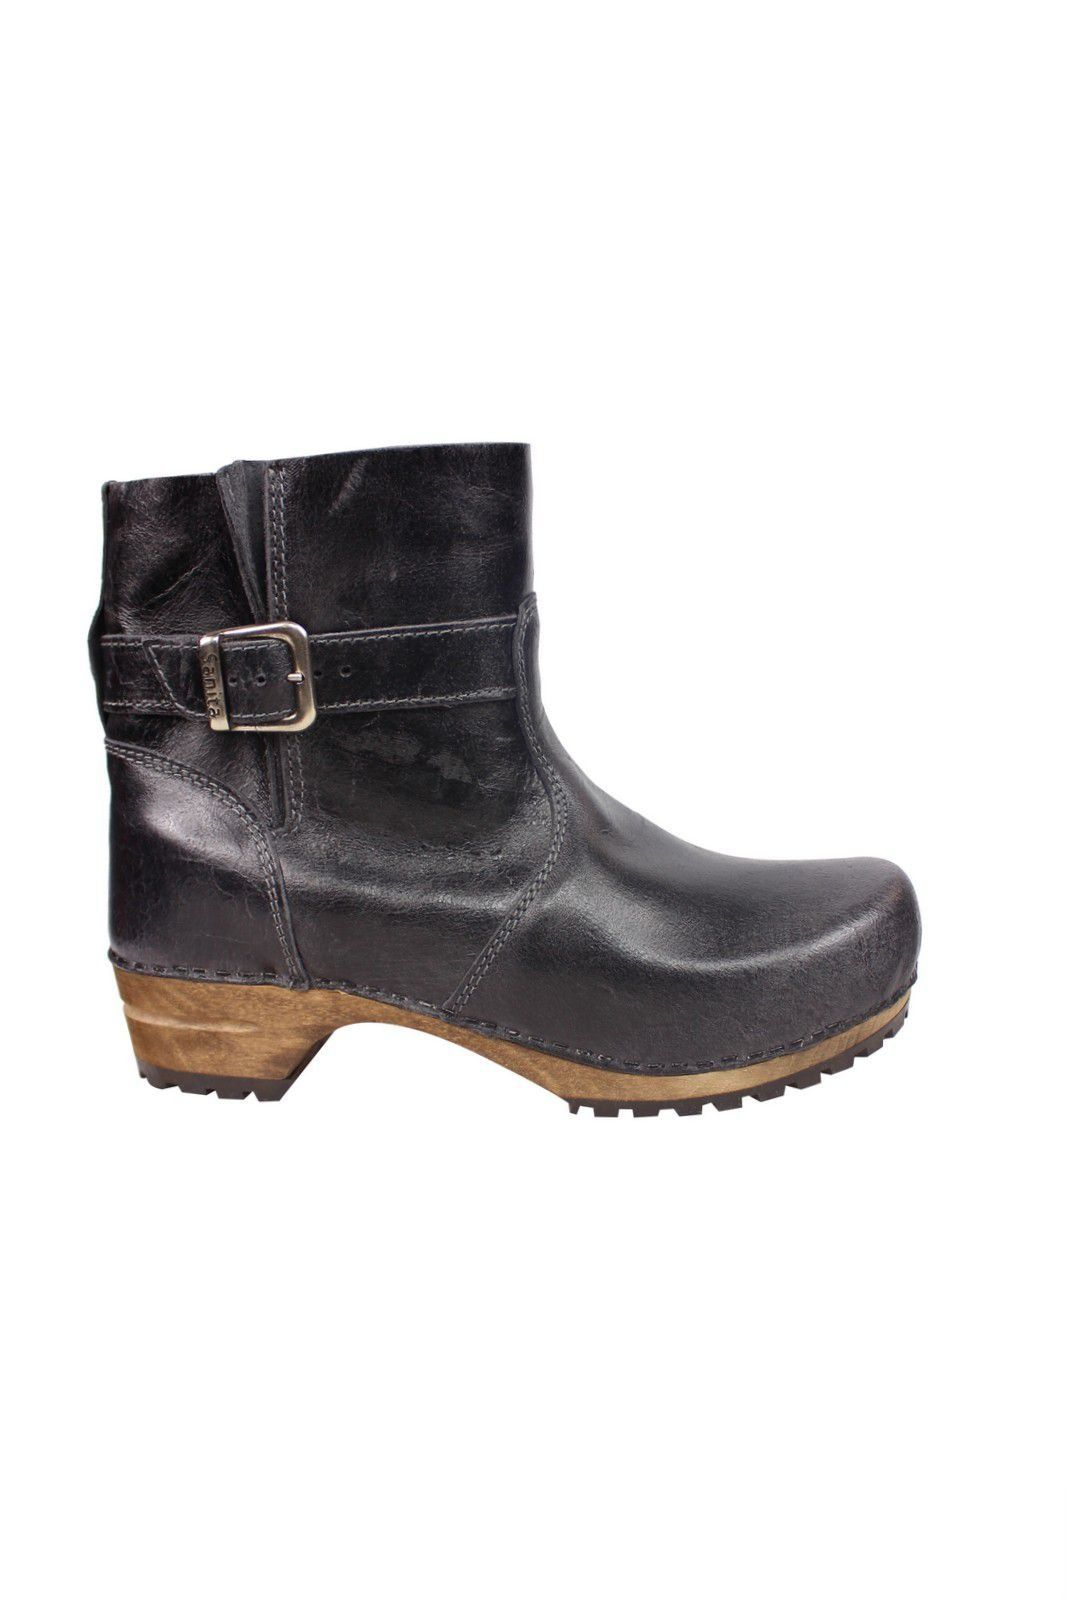 Sanita Mina Low Classic Clog Boot Black 452330 Side